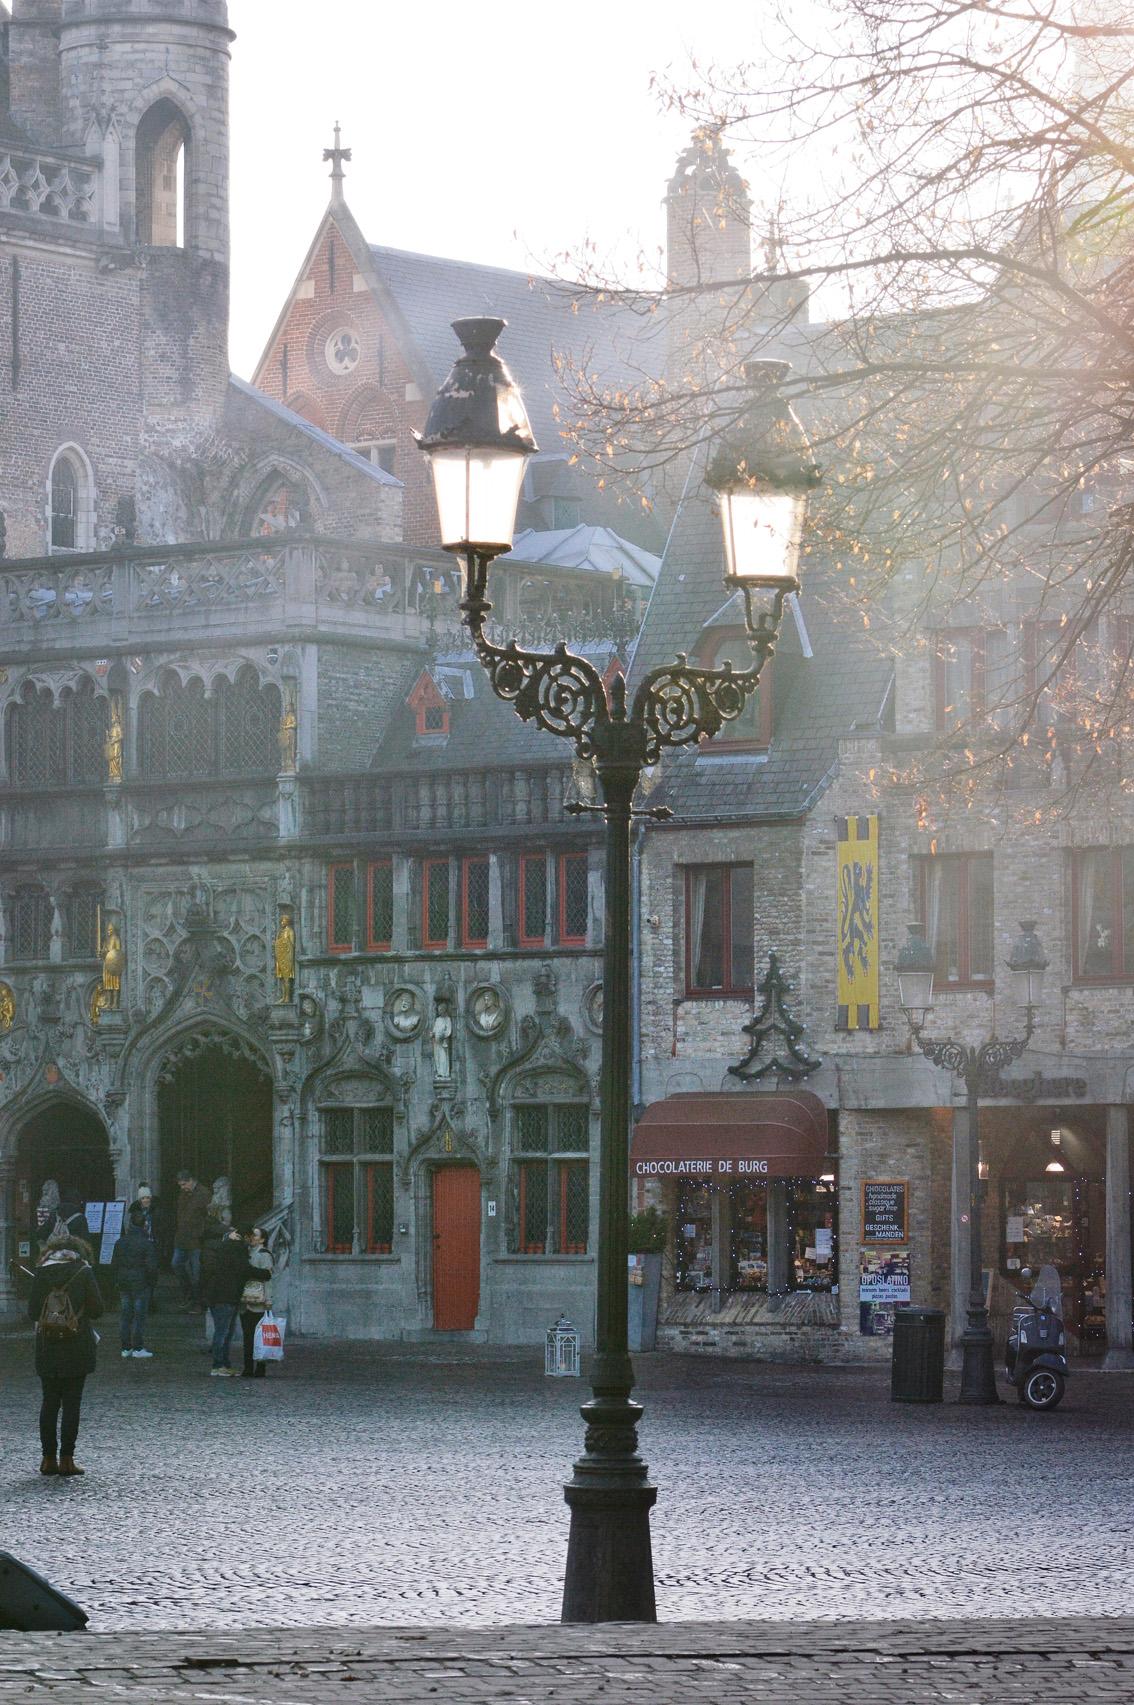 41-1 Un weekend in Belgio. Alla scoperta delle Fiandre: Bruges .